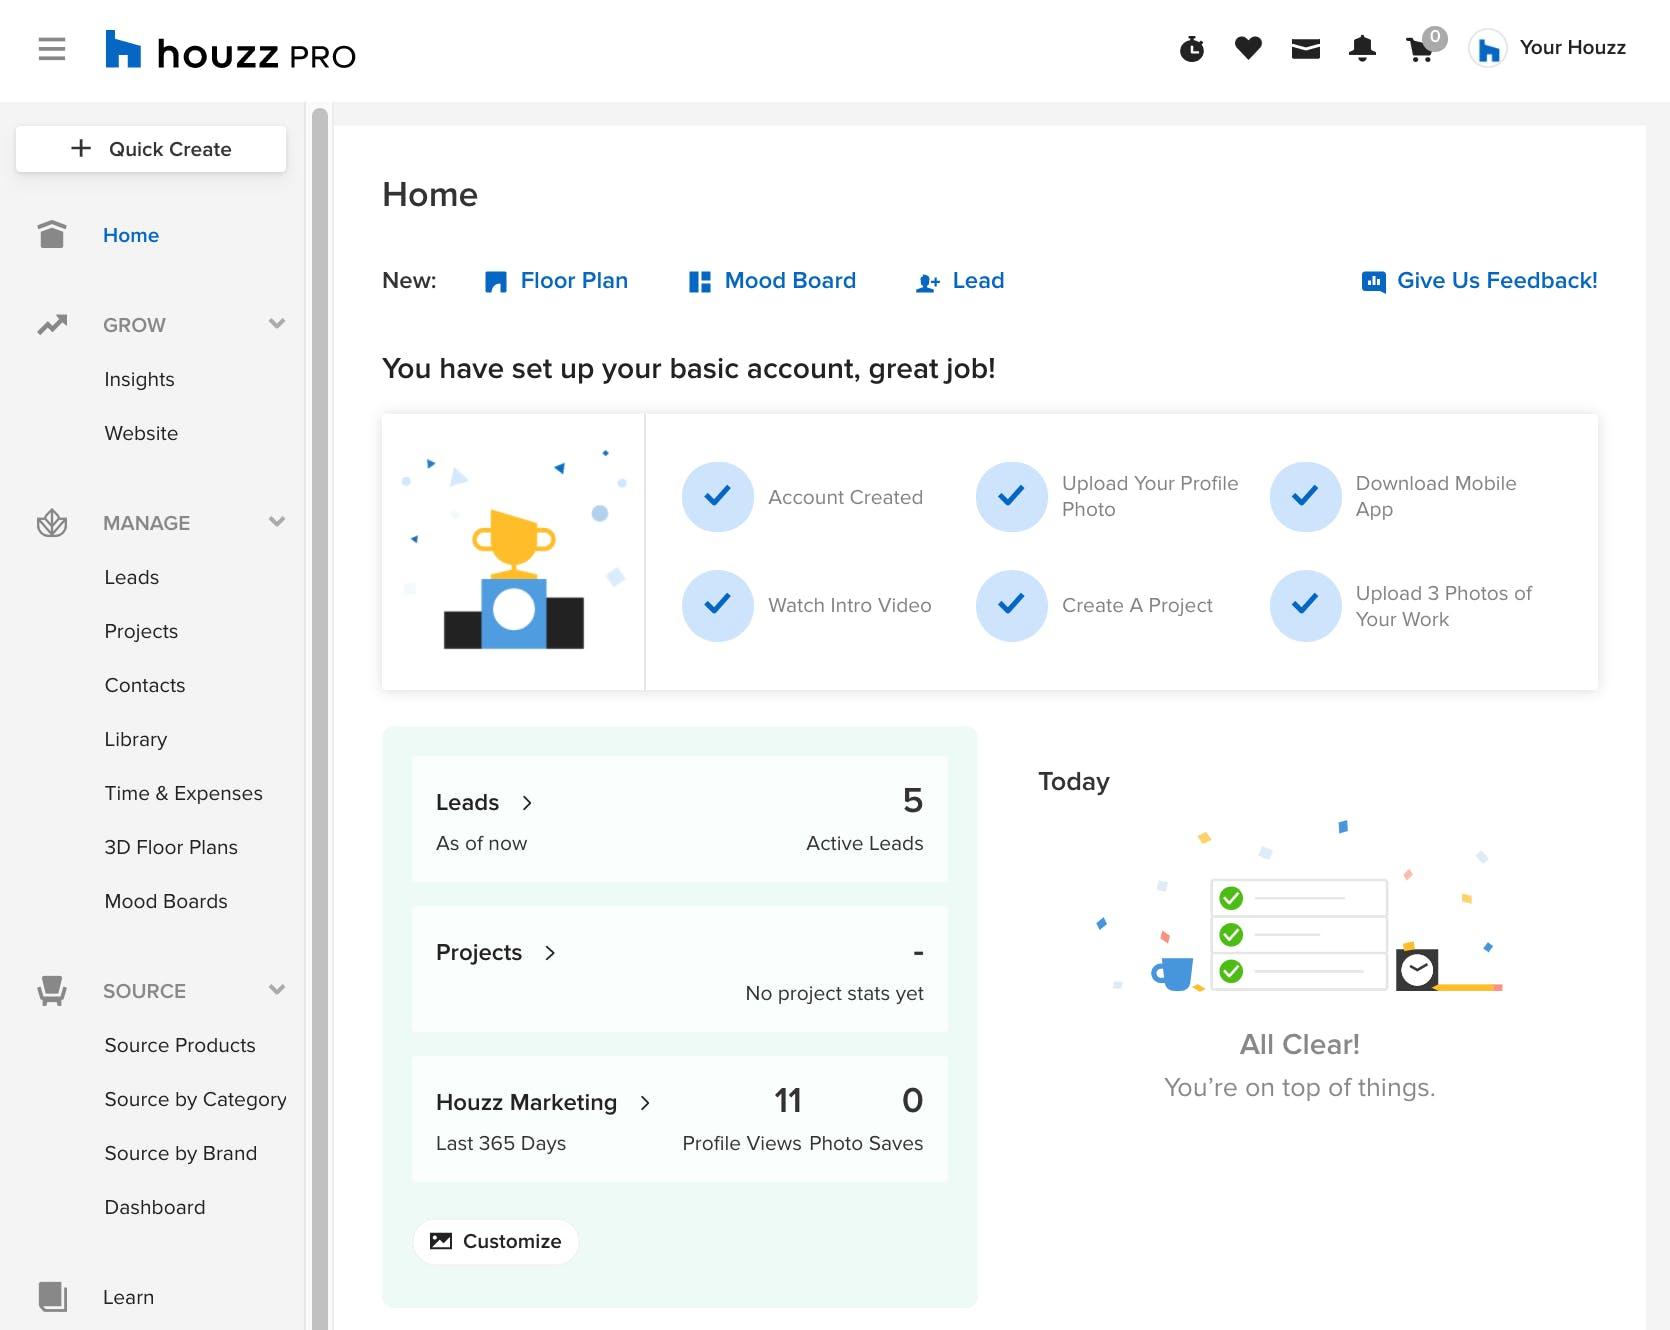 Houzz Pro homepage